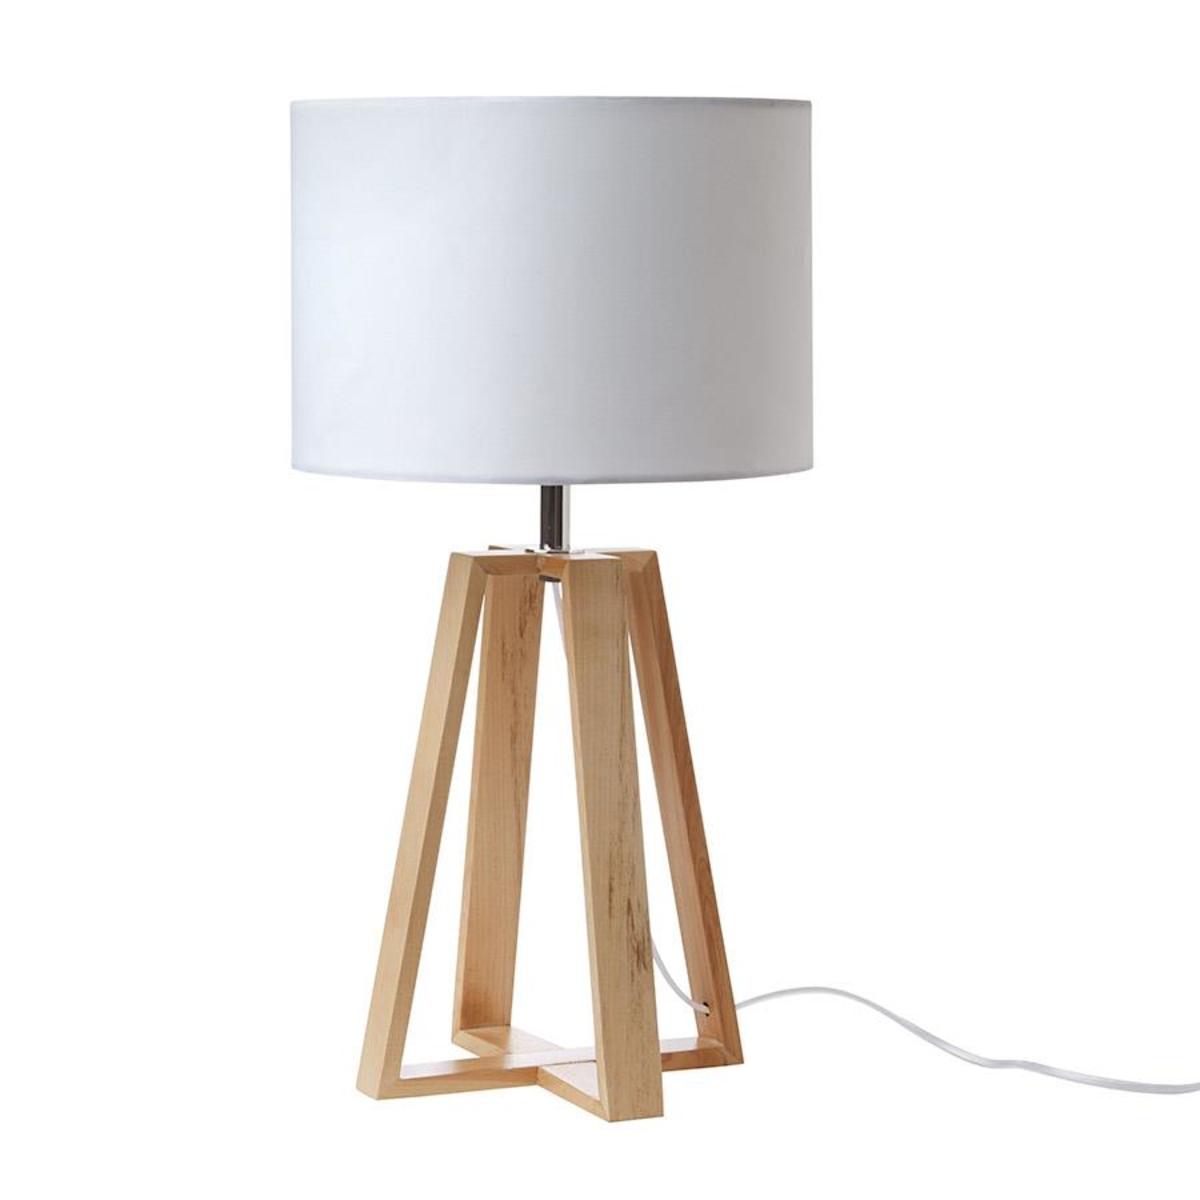 Wooden Lamp Kmart